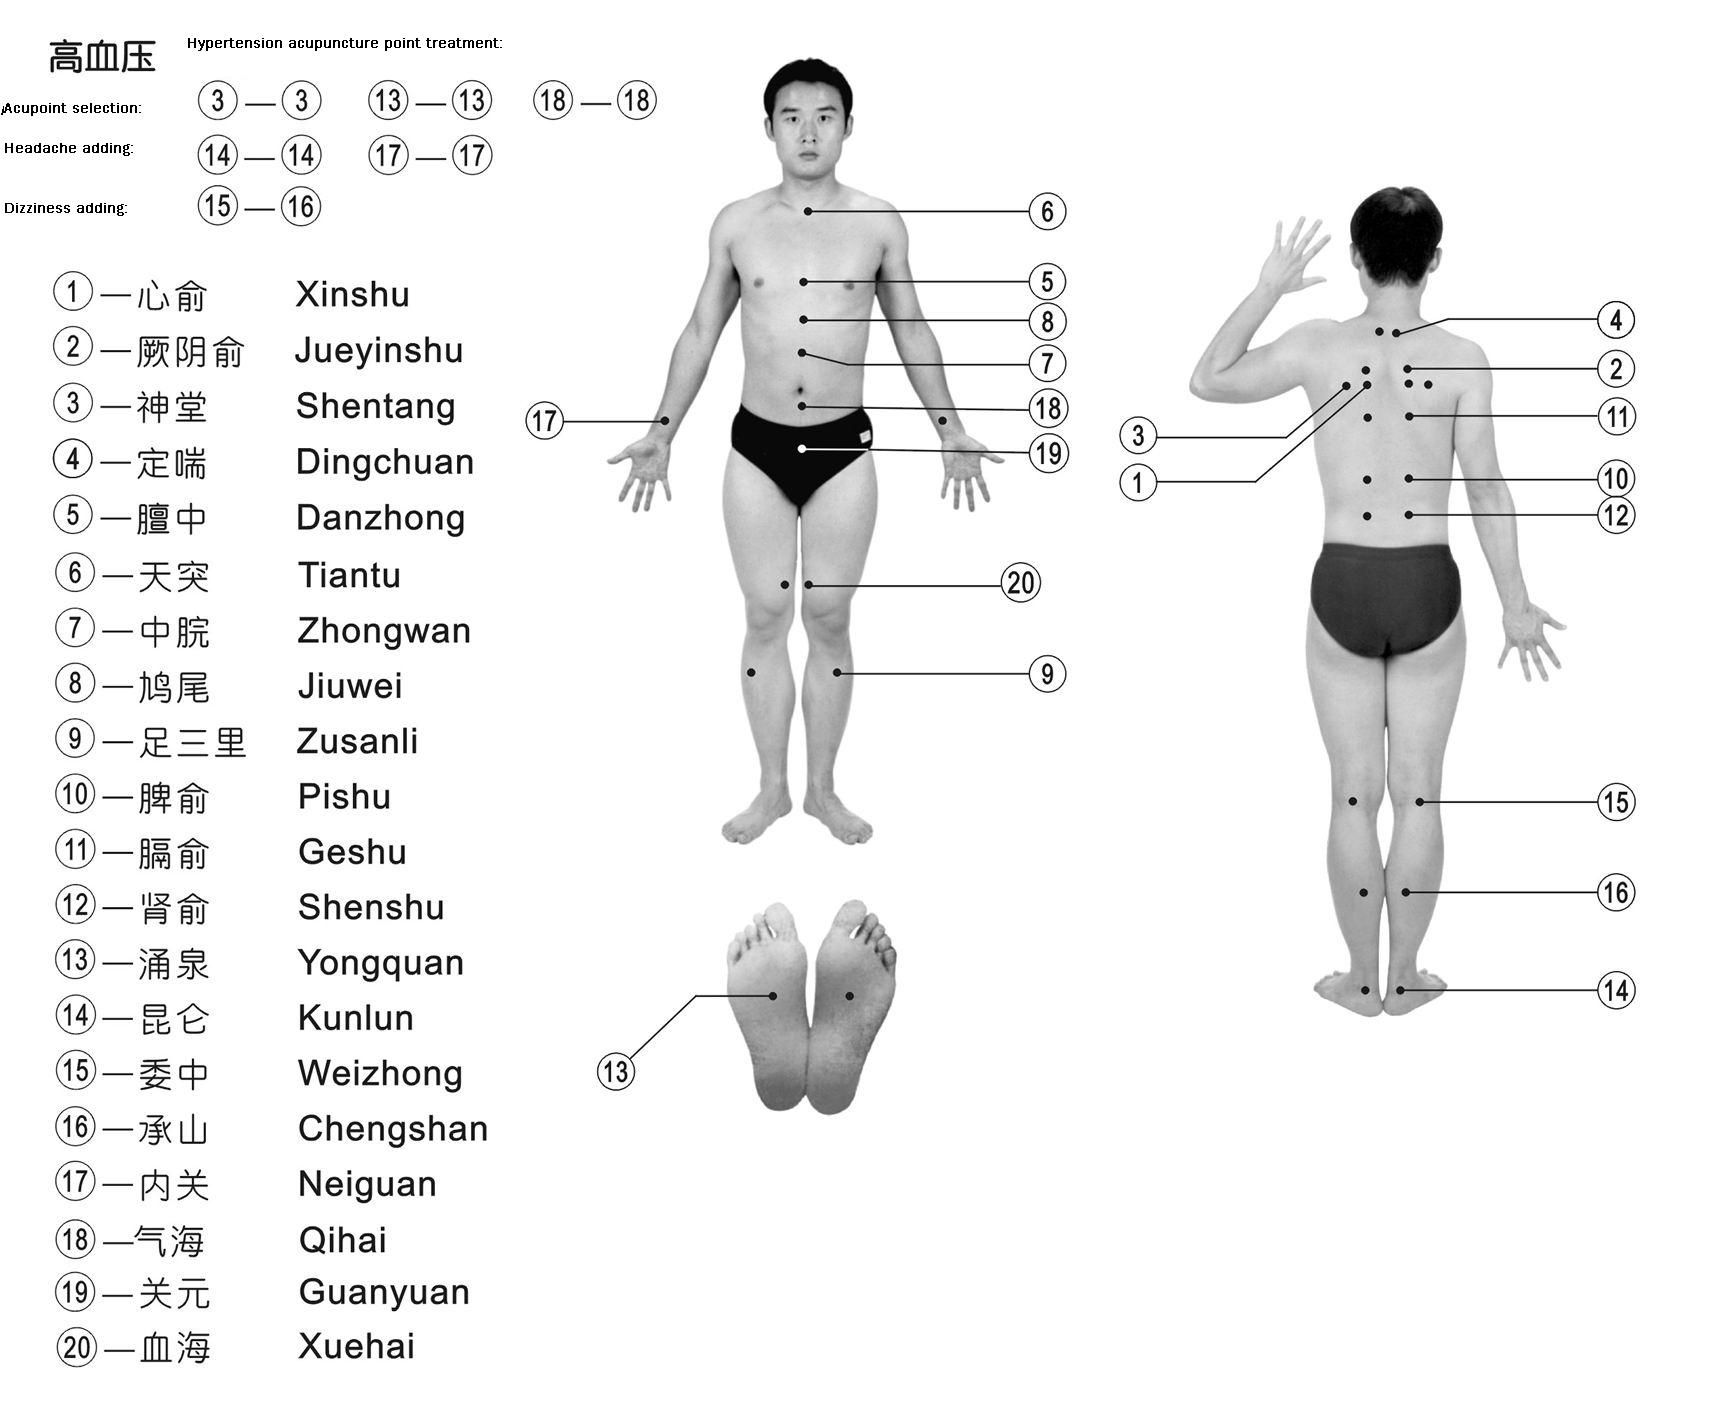 Weight loss tips in urdu tumblr for women in urdu by dr khurram weight loss tips in urdu tumblr for women in urdu by dr khurram 1724x1424 acupuncture pointshigh nvjuhfo Gallery